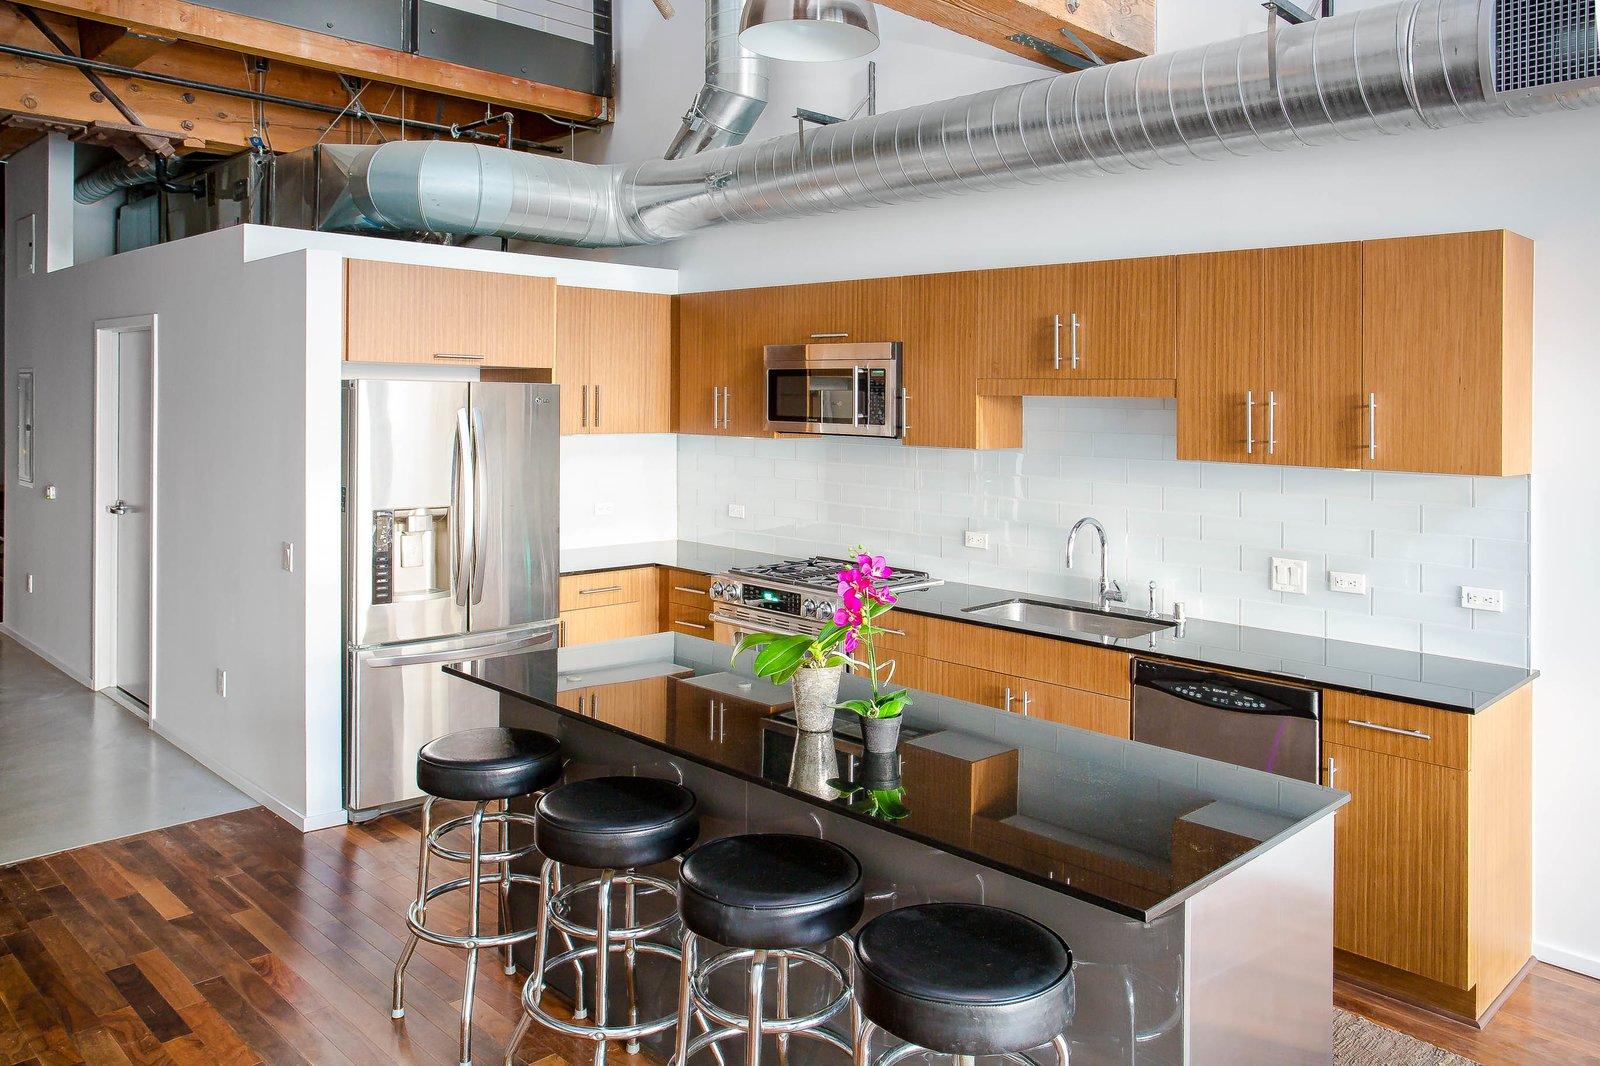 Kitchen, Refrigerator, Microwave, Dishwasher, Wood, Medium Hardwood, Subway Tile, Ceiling, Pendant, Granite, and Drop In  Best Kitchen Dishwasher Subway Tile Photos from Modern Downtown LA Loft